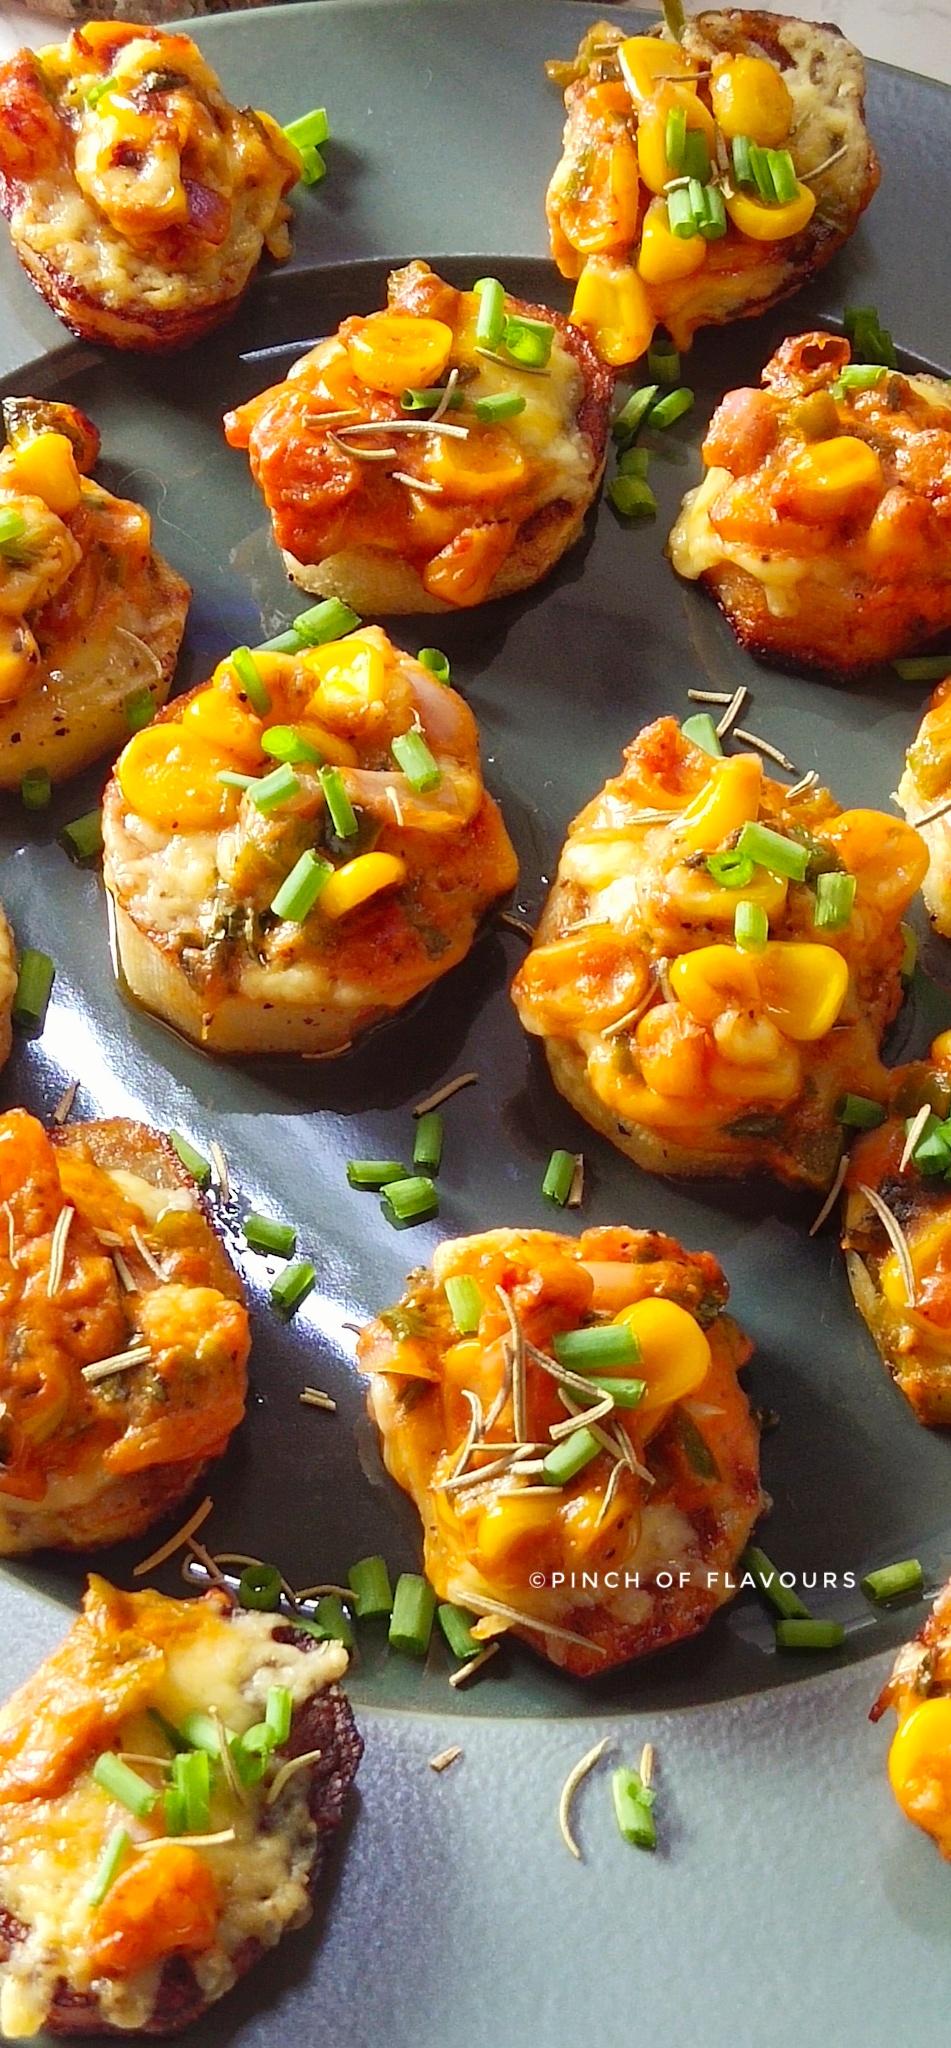 Baked Potato Slices - sliced baked potatoes